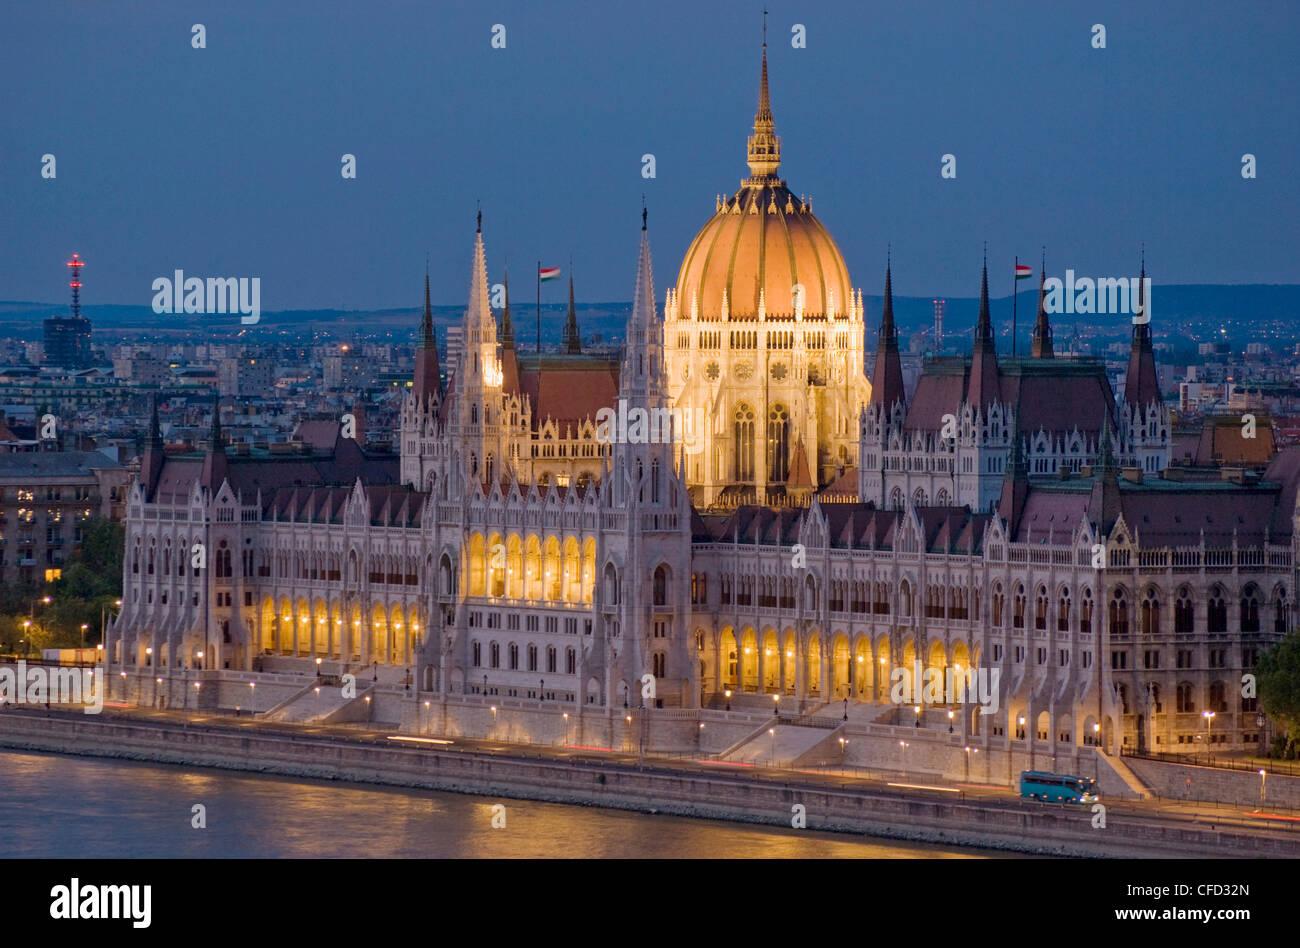 Hungarian Parliament,illuminated at night, and the River Danube, Budapest, Hungary - Stock Image